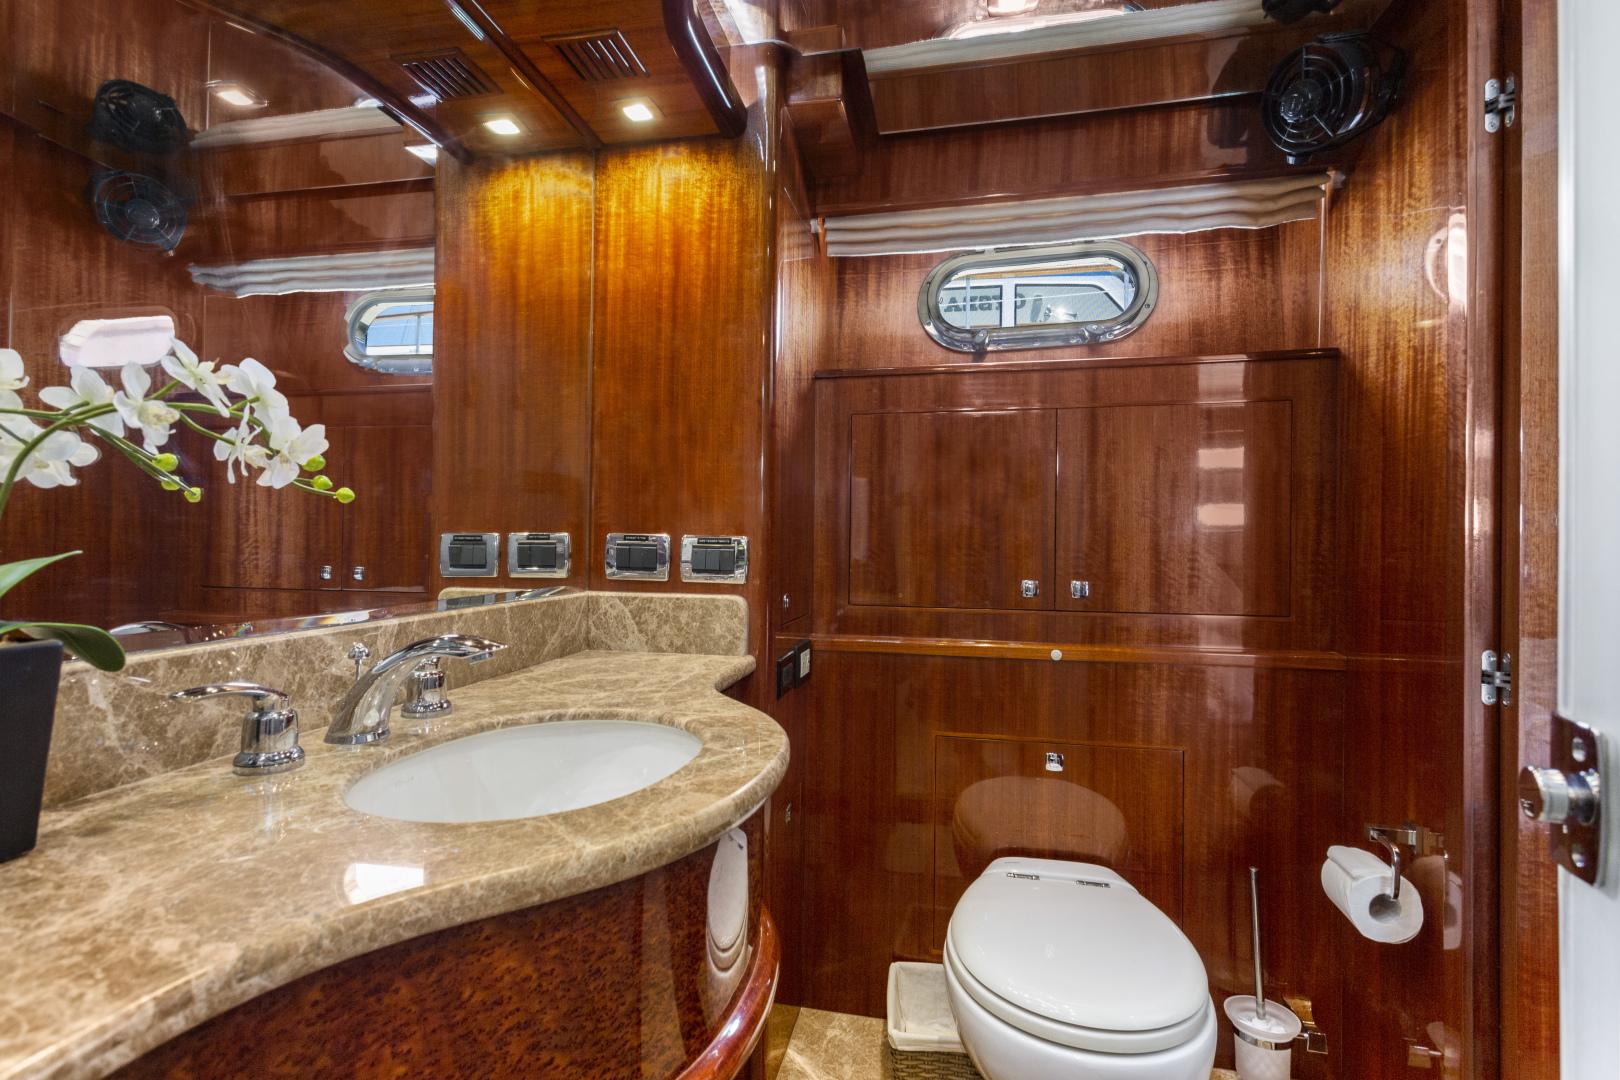 Hampton-76 Skylounge Motoryacht 2014-ODYSEA San Diego-California-United States-MASTER HEAD-1165165 | Thumbnail